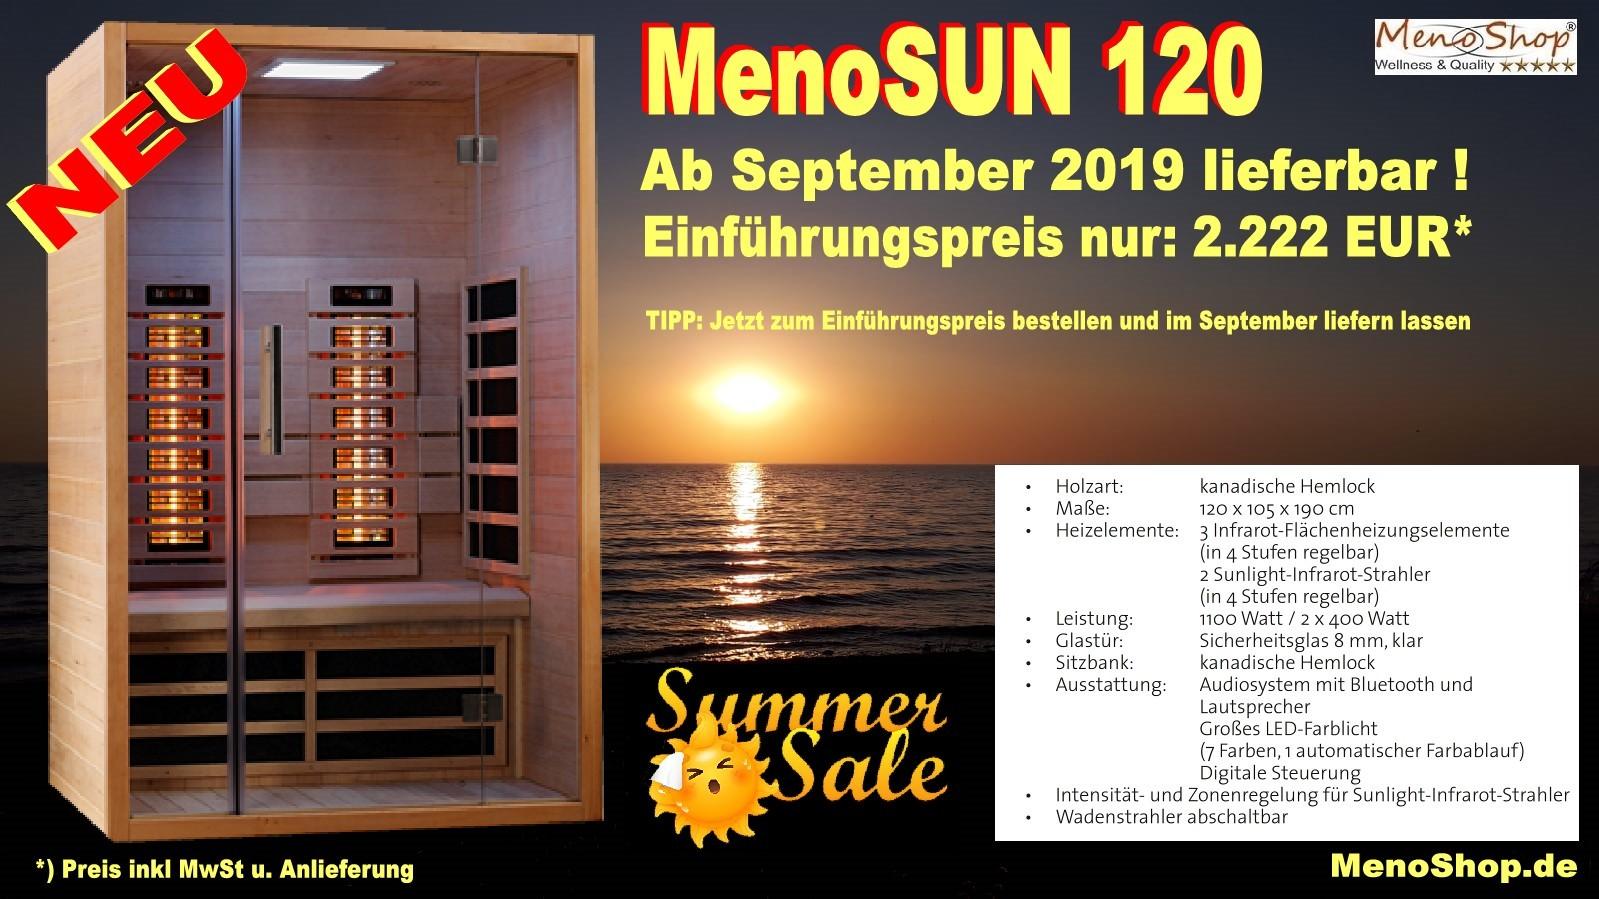 fachhandel sauna aufguss outdoor whirlpool zubeh r g nstig. Black Bedroom Furniture Sets. Home Design Ideas